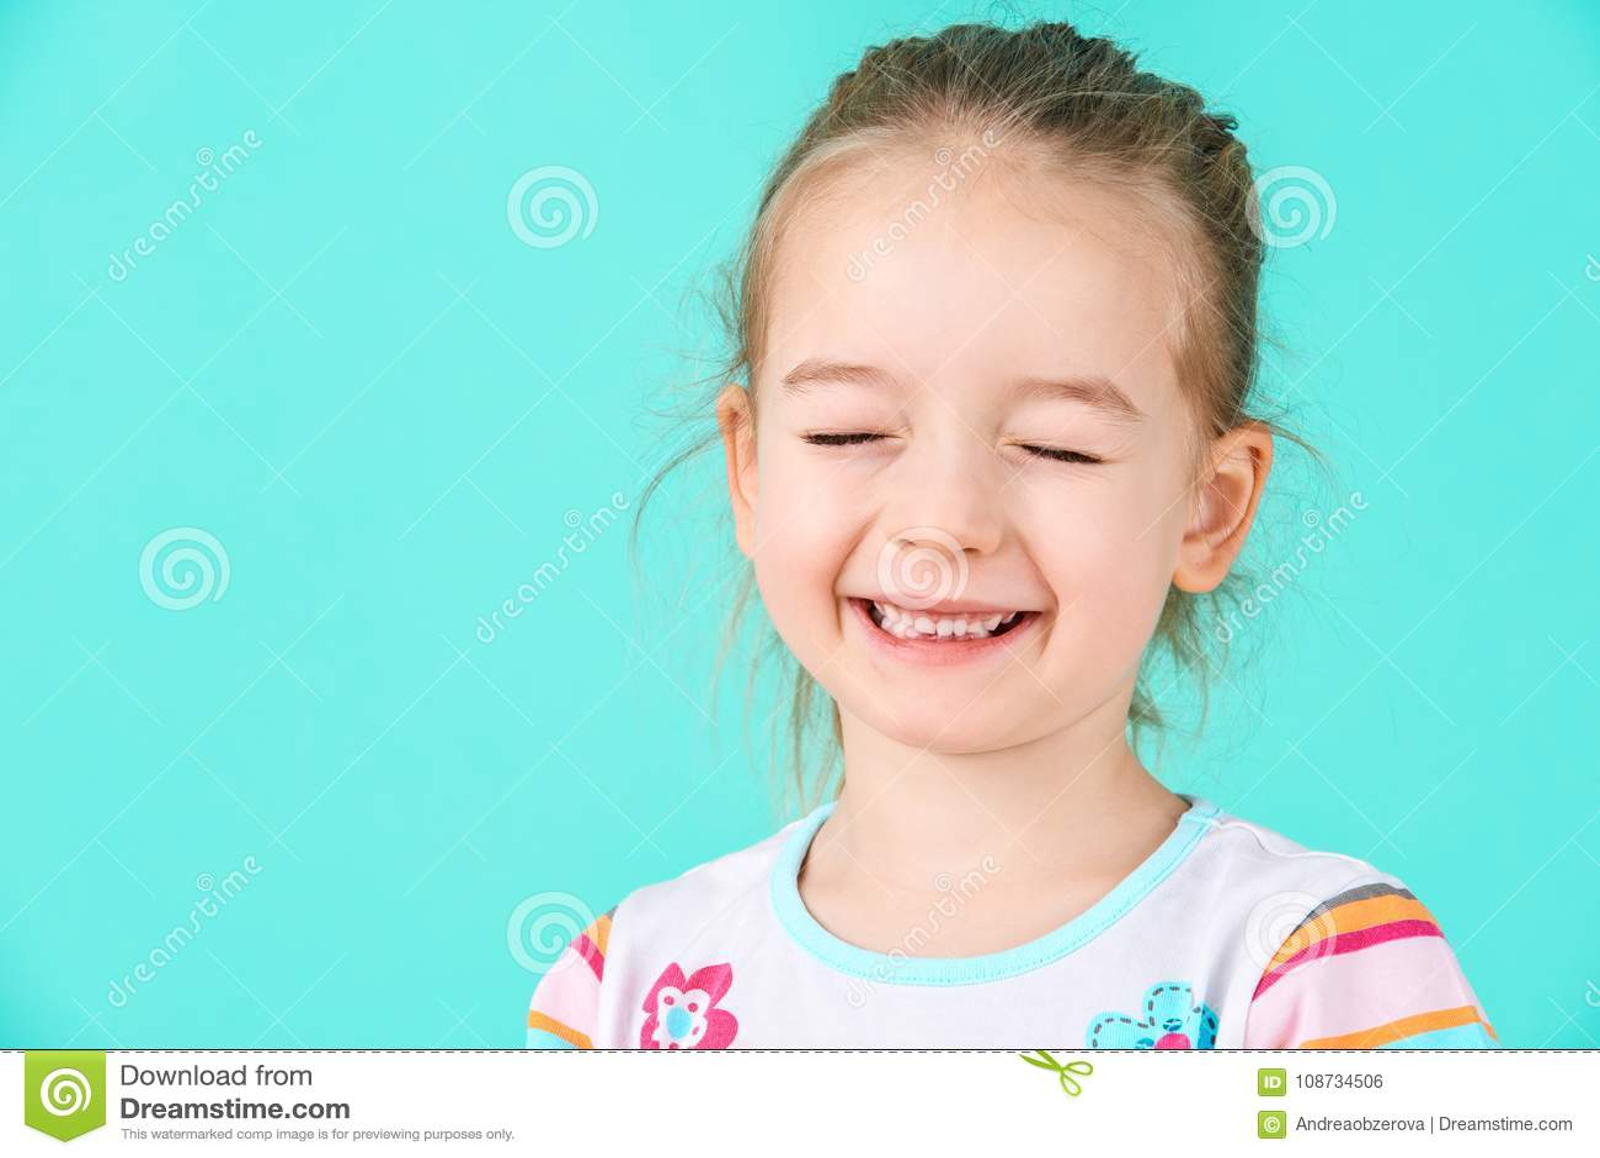 Adorable little girl with attitude. Cheeky preschooler headshot portrait.